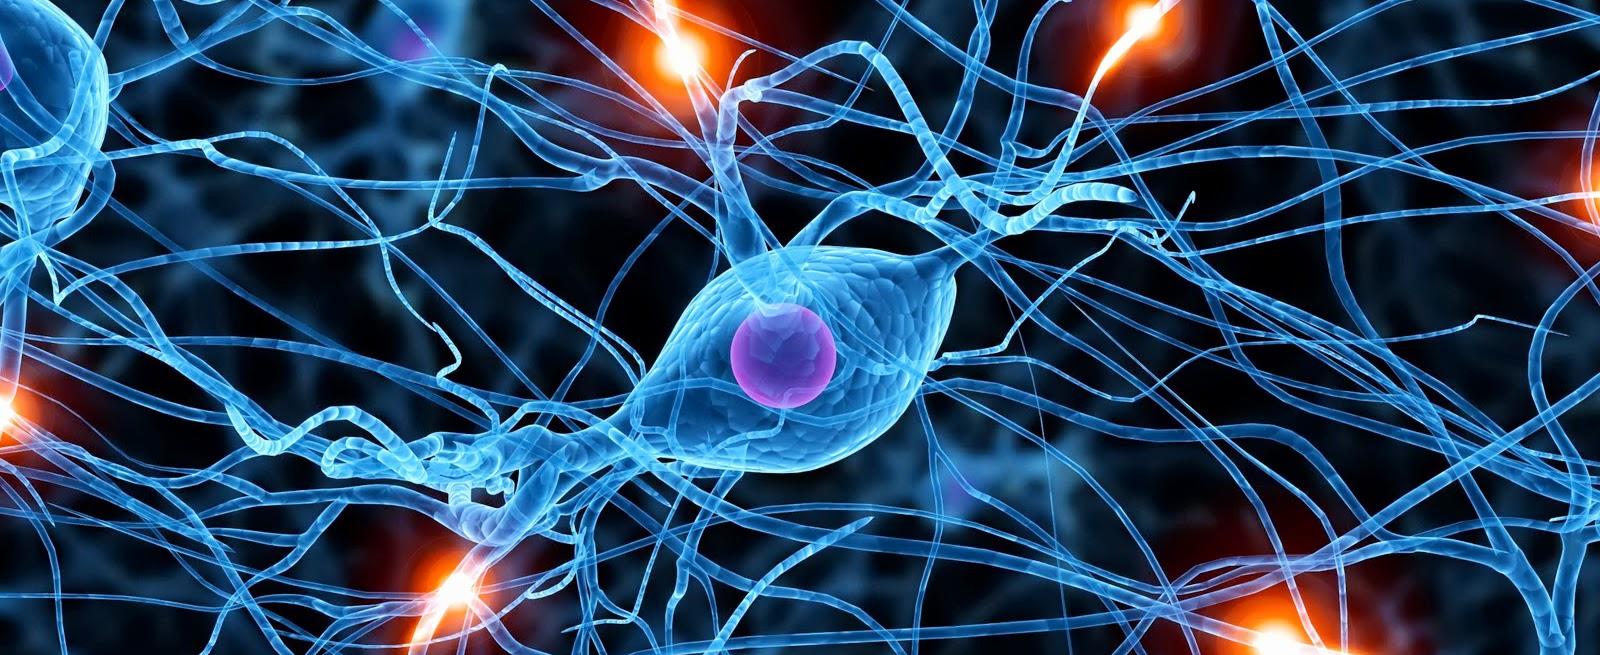 synapse wallpaper download - photo #34